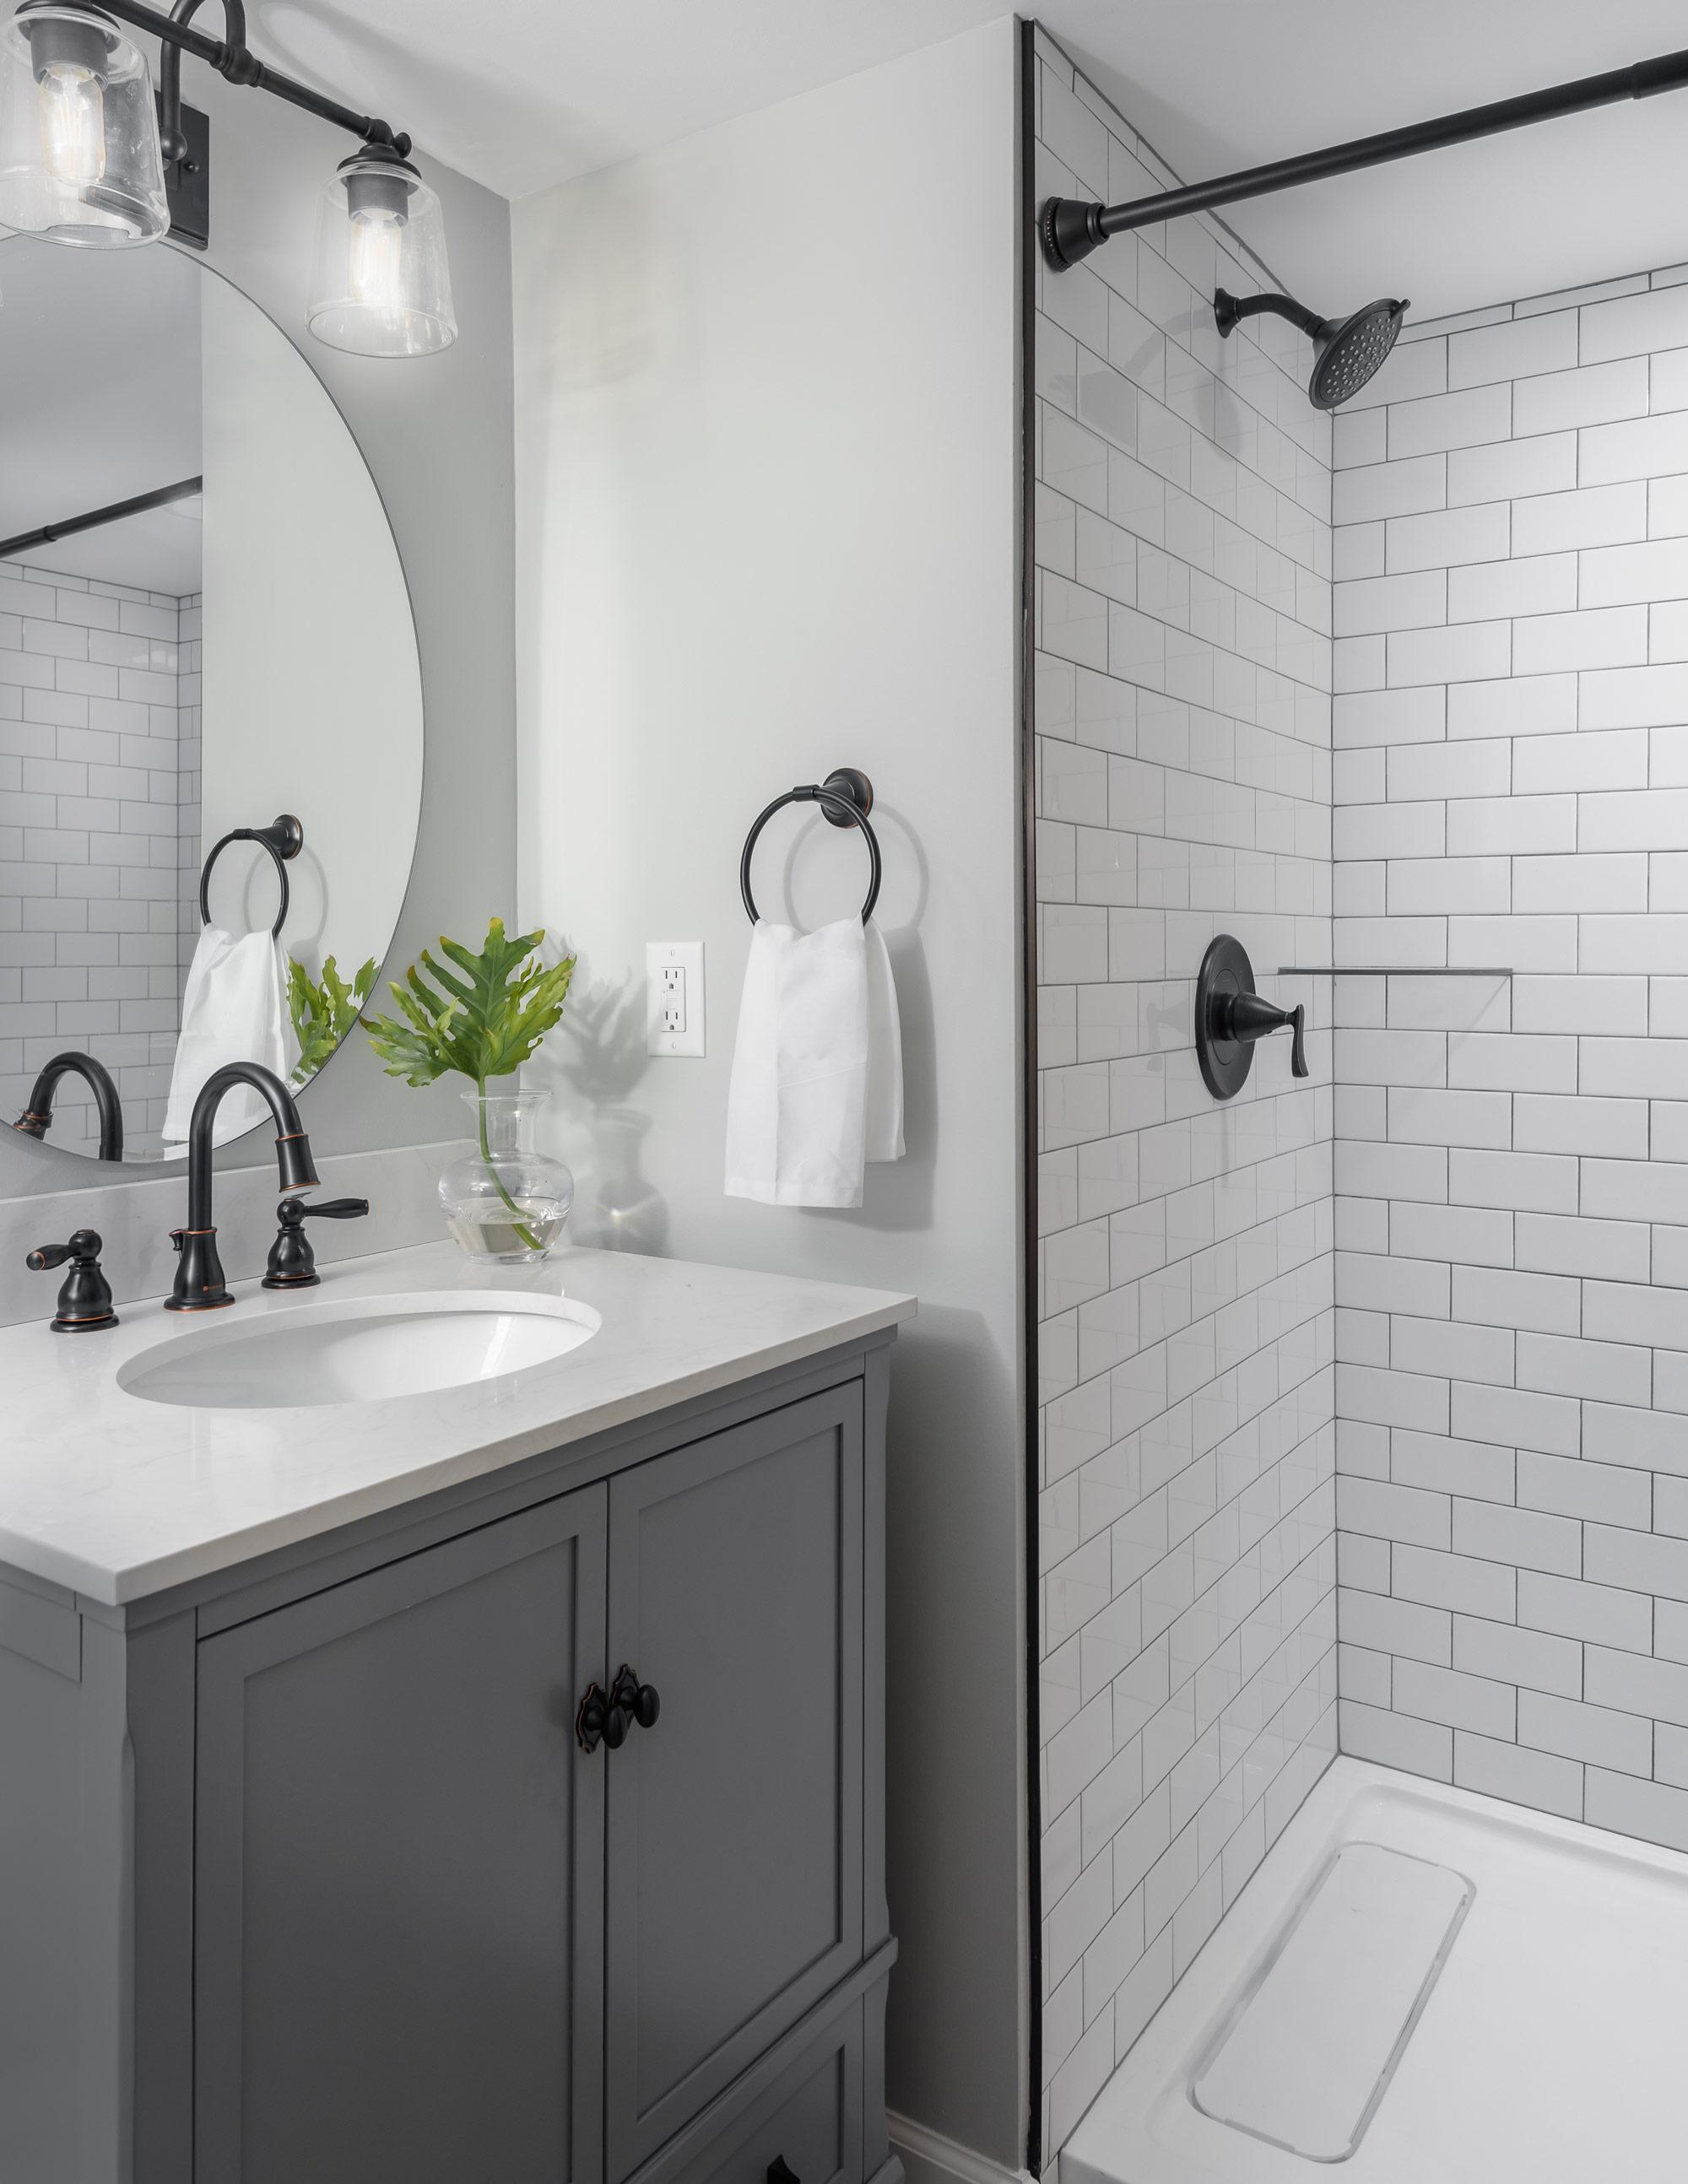 Chattanoogoa-bathroom.jpg